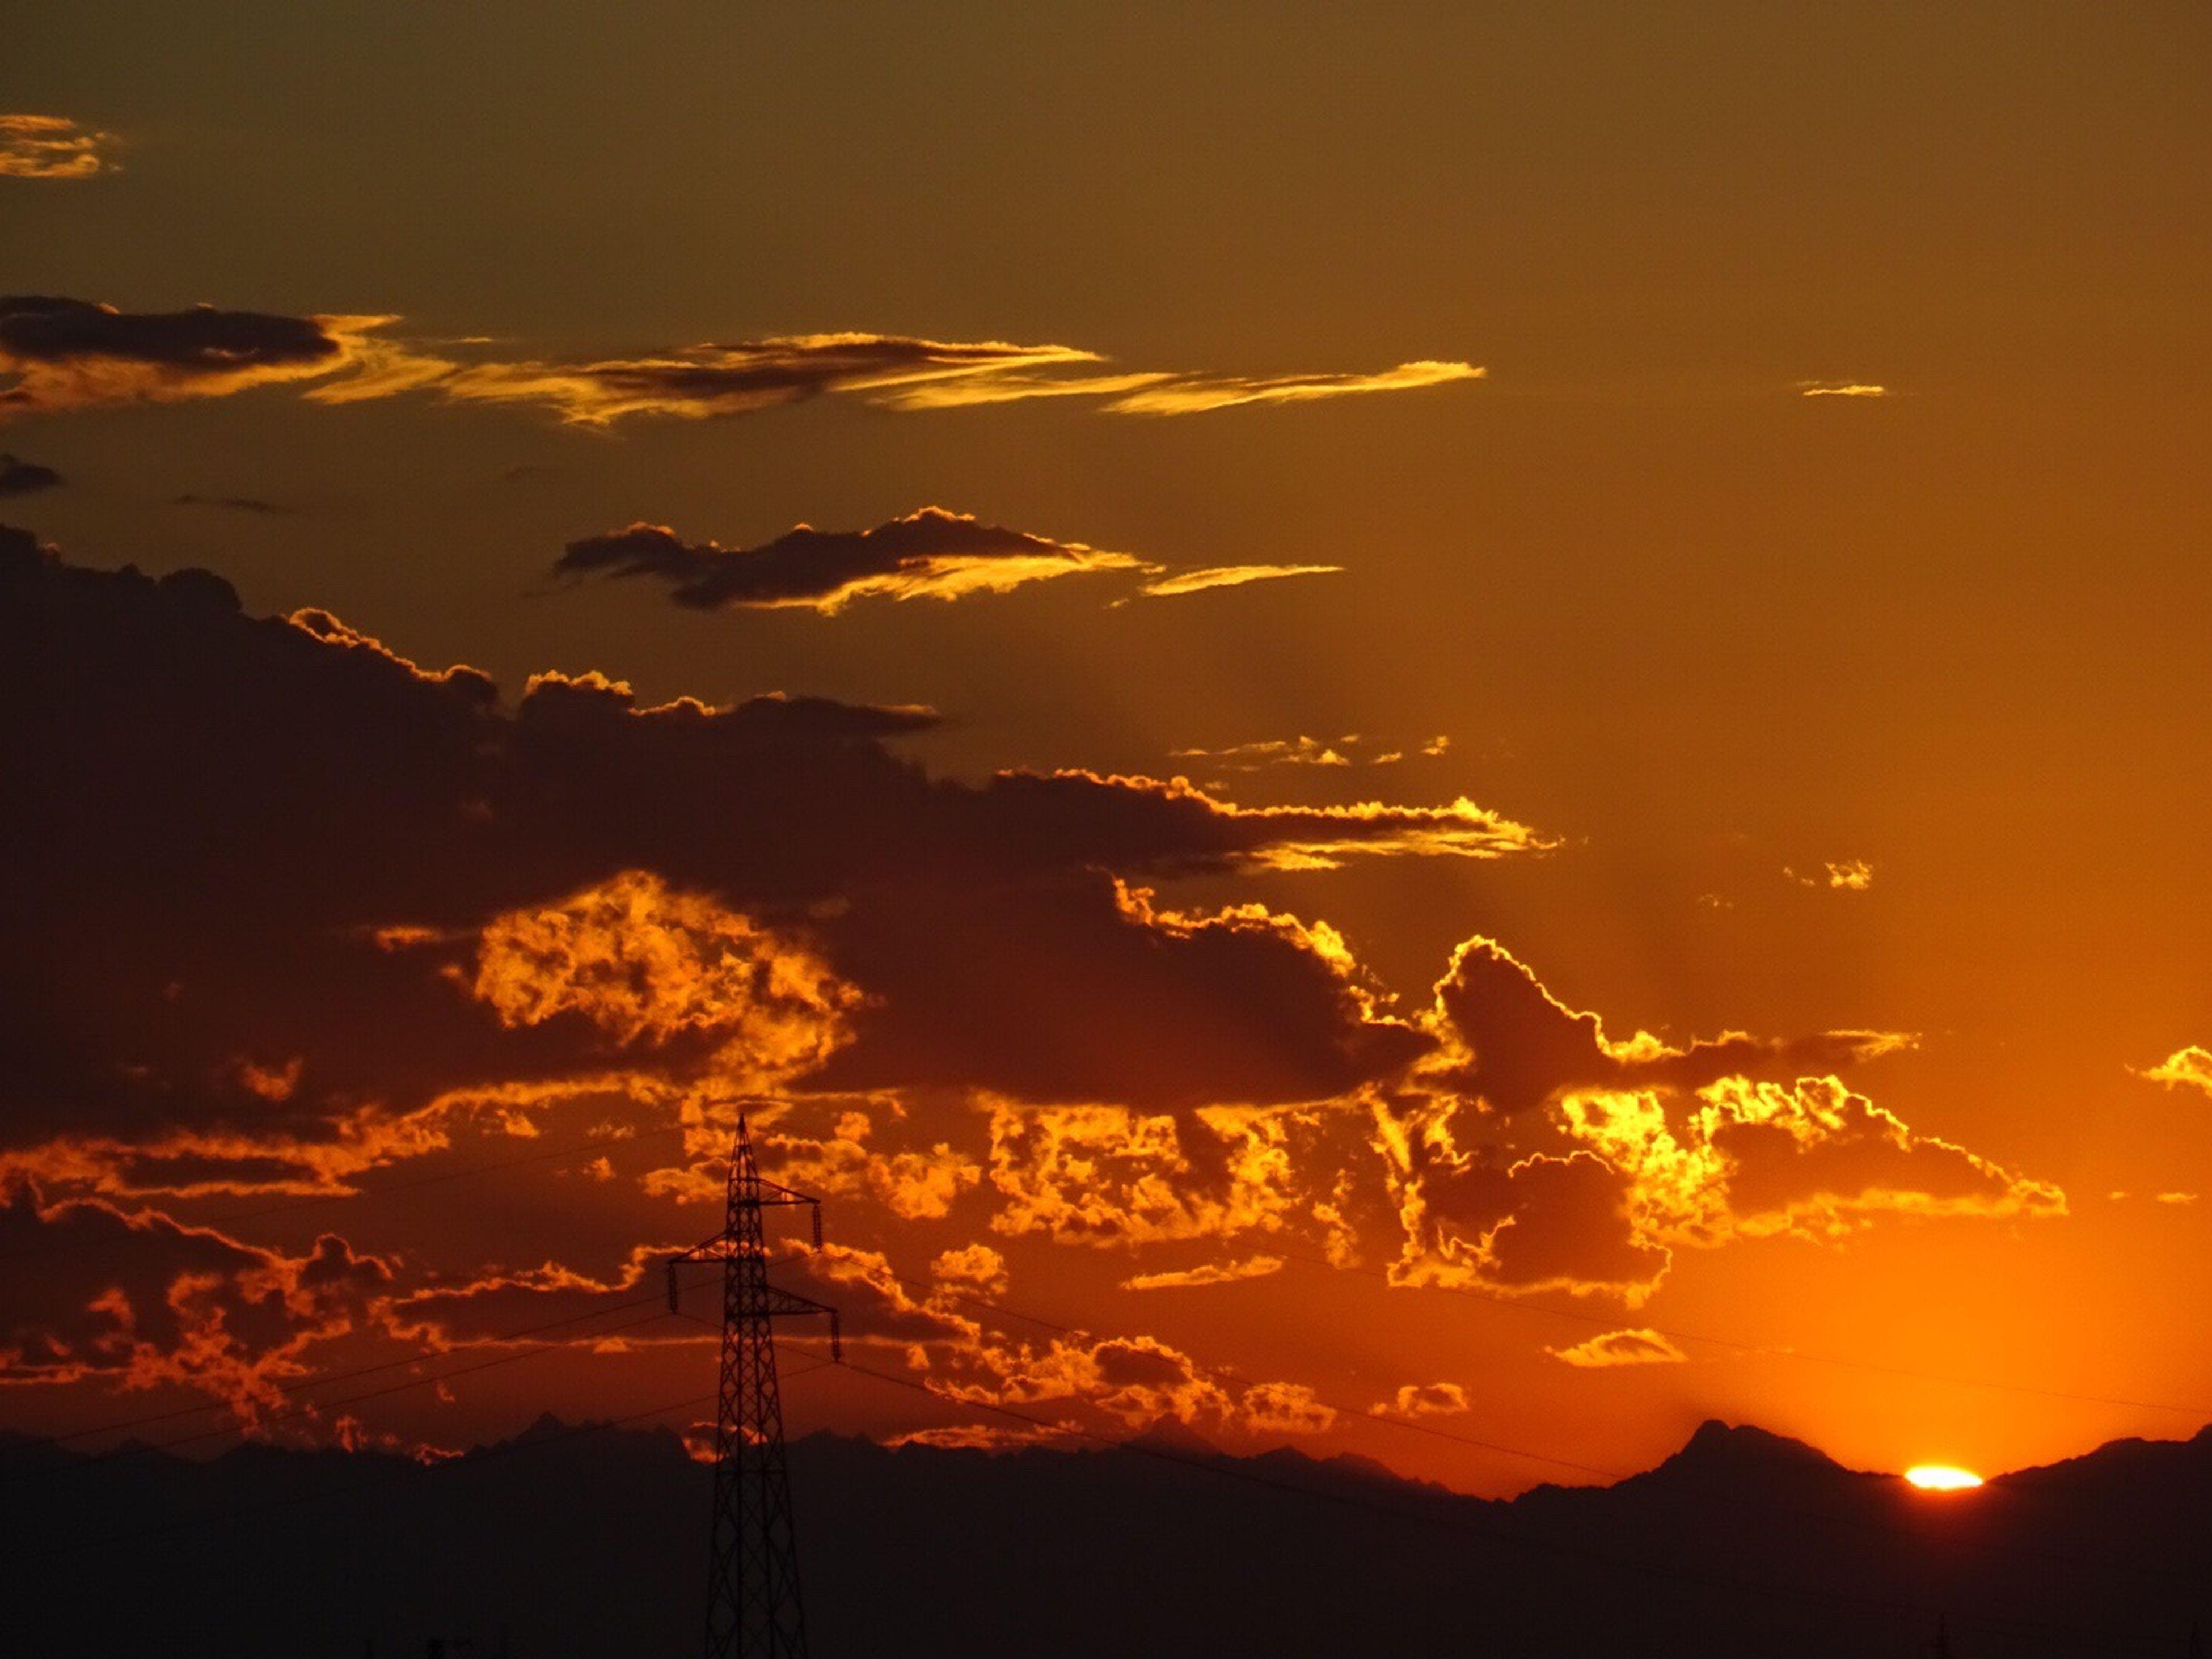 sunset, silhouette, orange color, scenics, sky, beauty in nature, tranquil scene, sun, tranquility, idyllic, nature, cloud - sky, dramatic sky, dark, majestic, cloud, outdoors, back lit, outline, landscape, moody sky, no people, power supply, non-urban scene, sunbeam